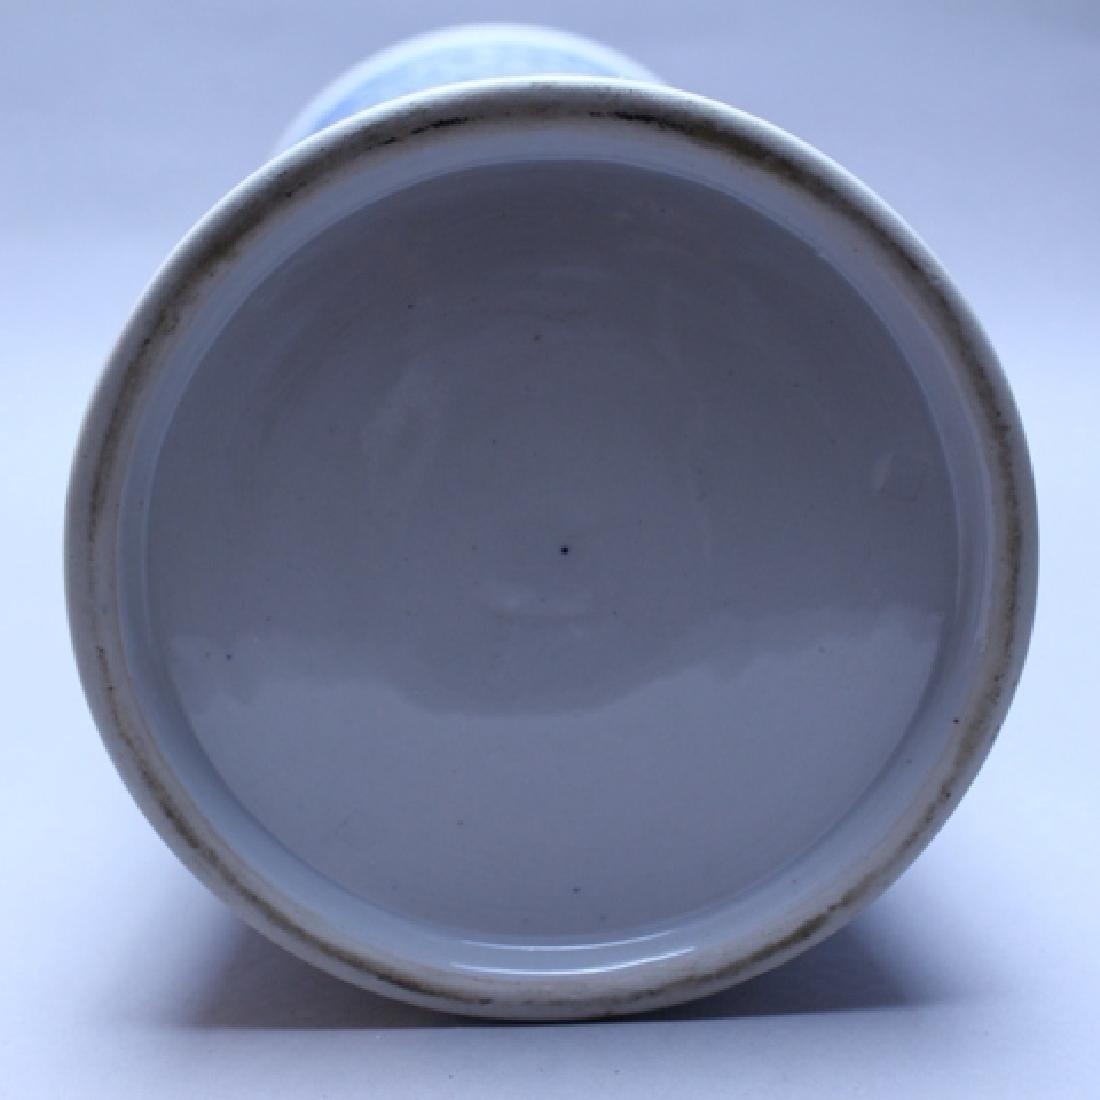 Decorative Blue and White Porcelain Gu Vase - 8